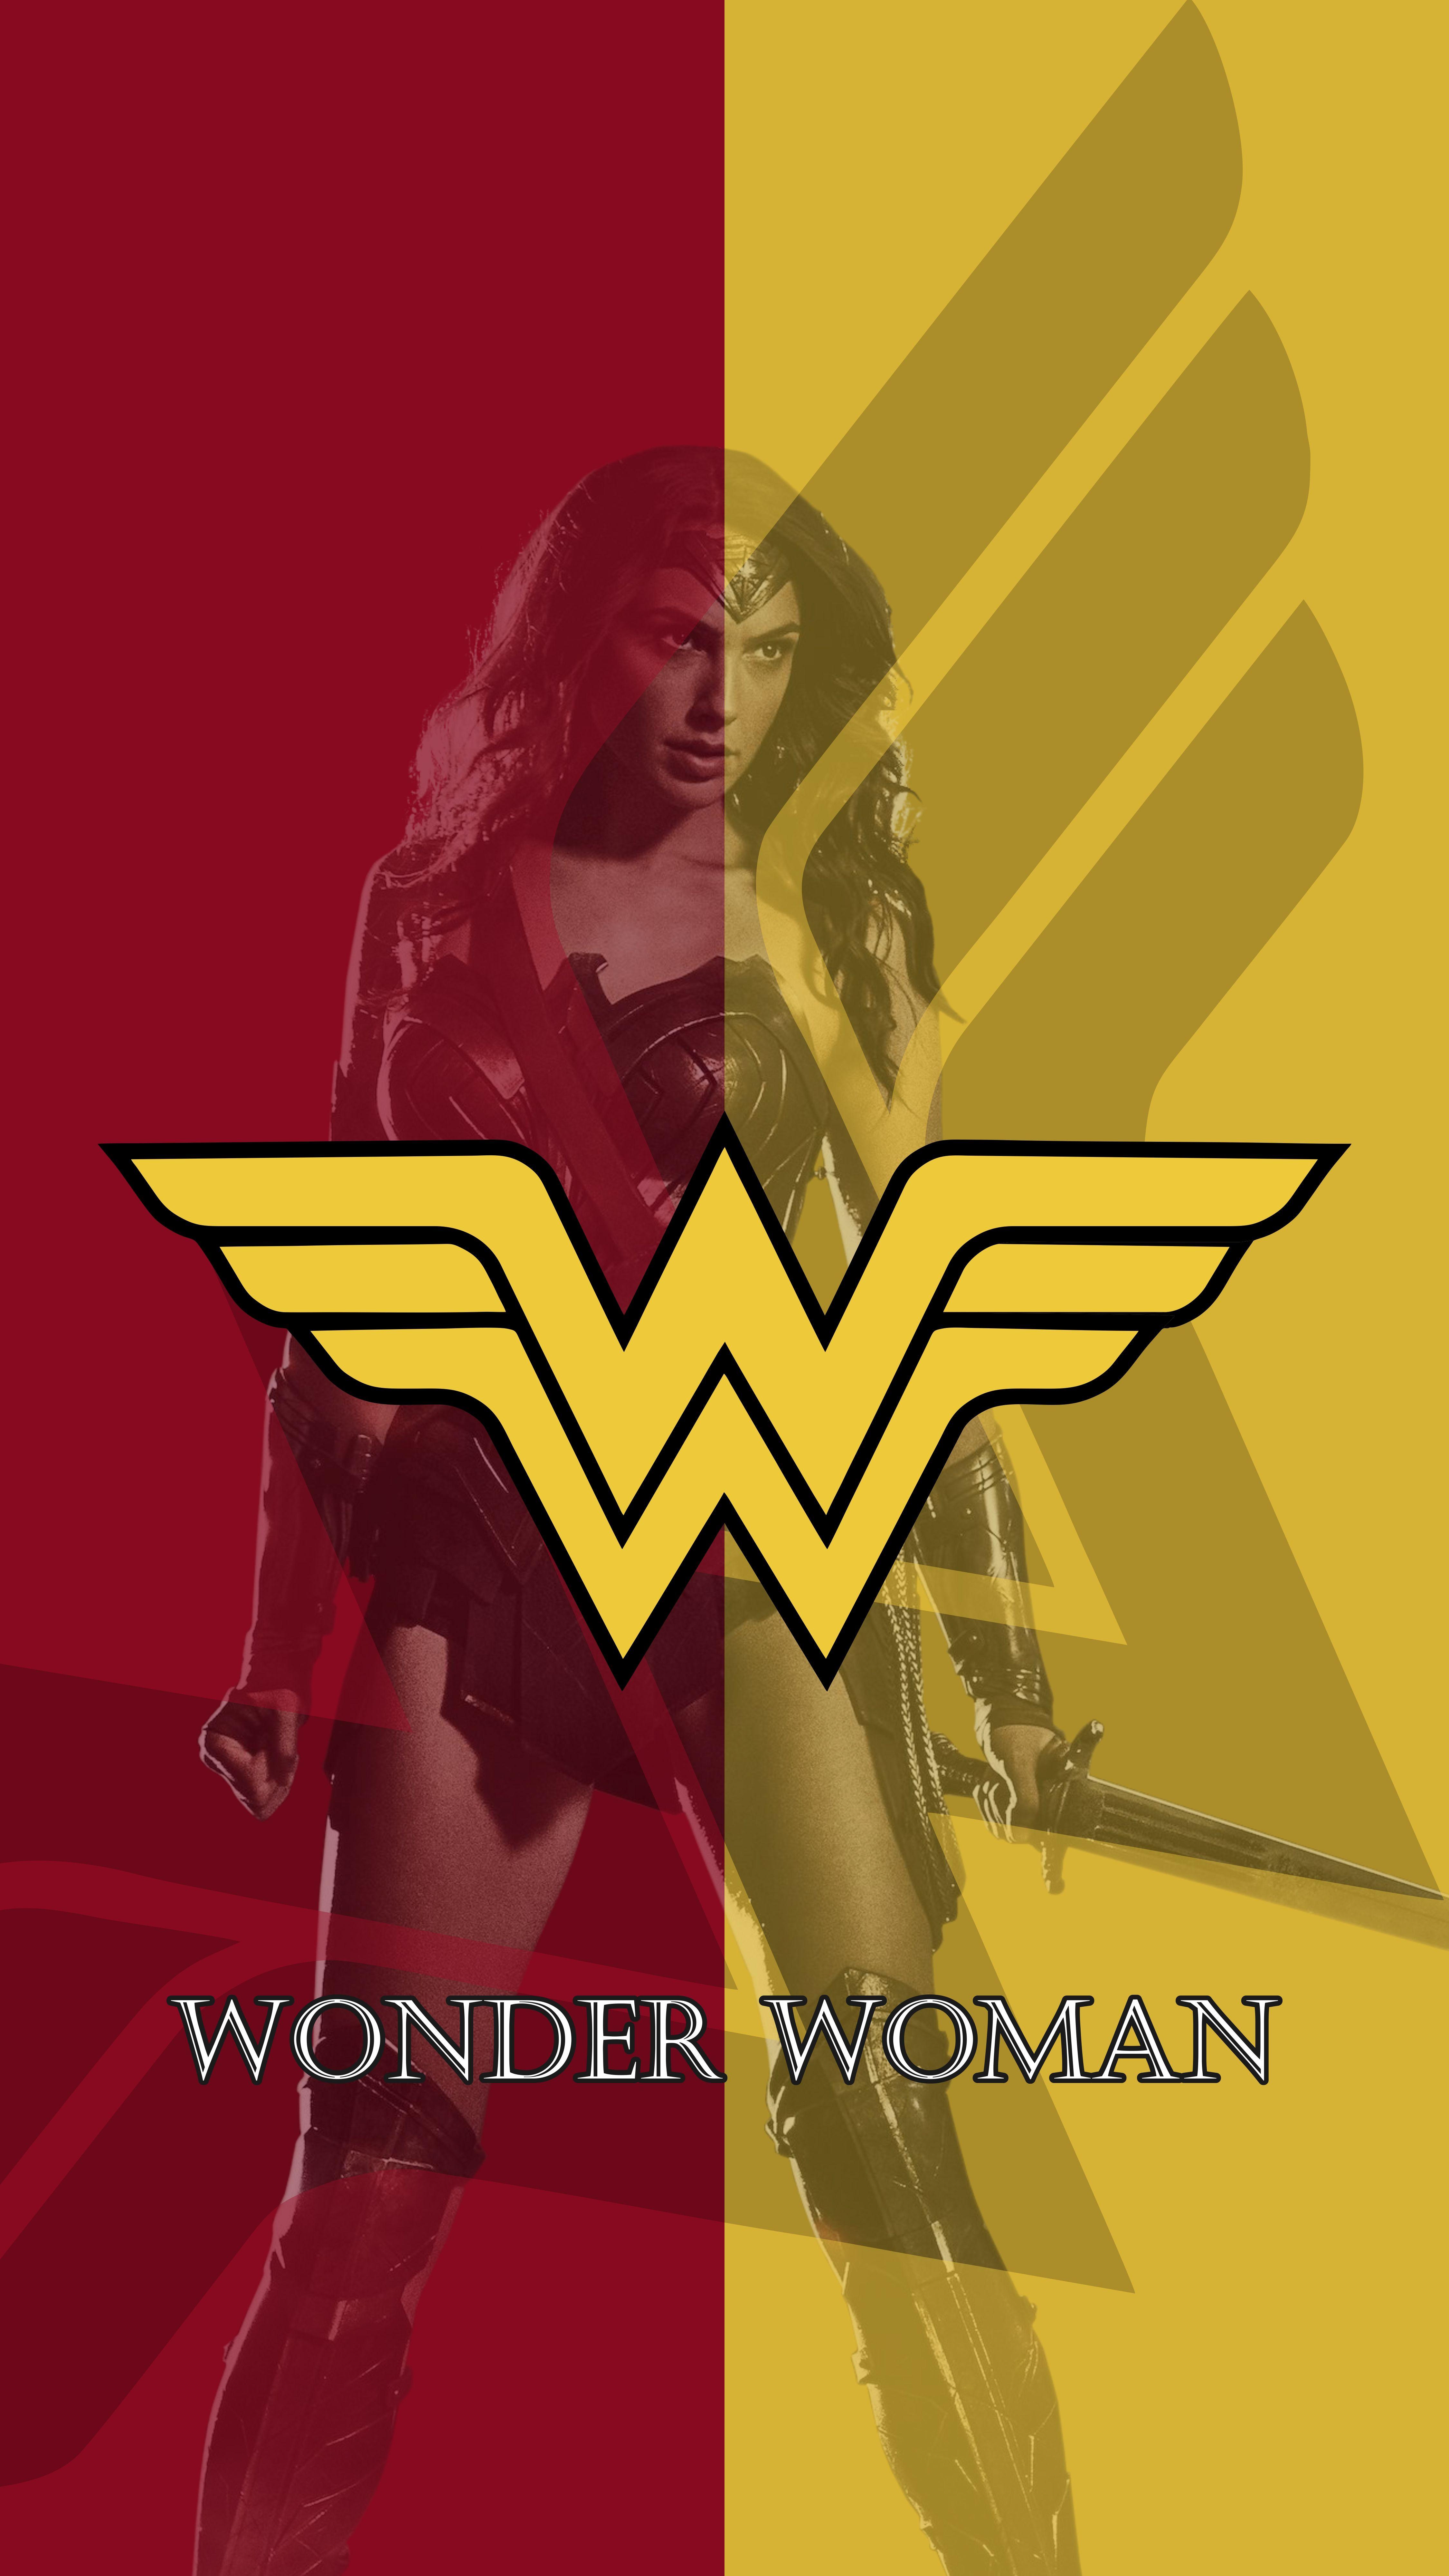 Wonder Woman Wallpaper Hd Android